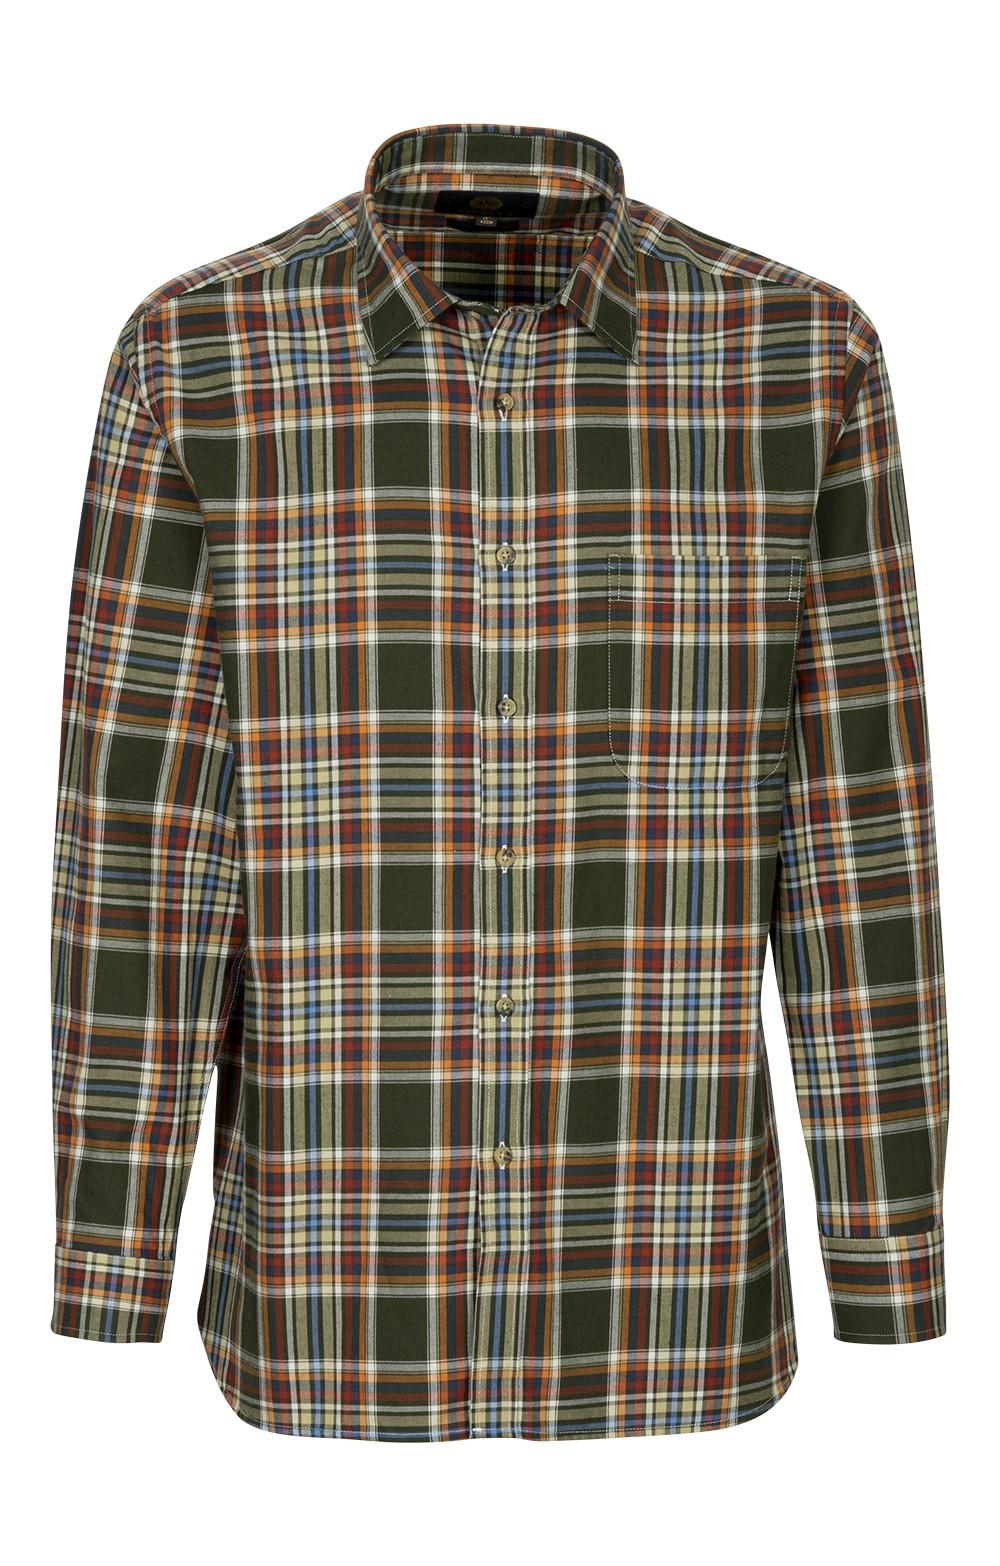 c76c6ea3 Mens Viyella Cotton/Wool Blend Shirt - House of Bruar